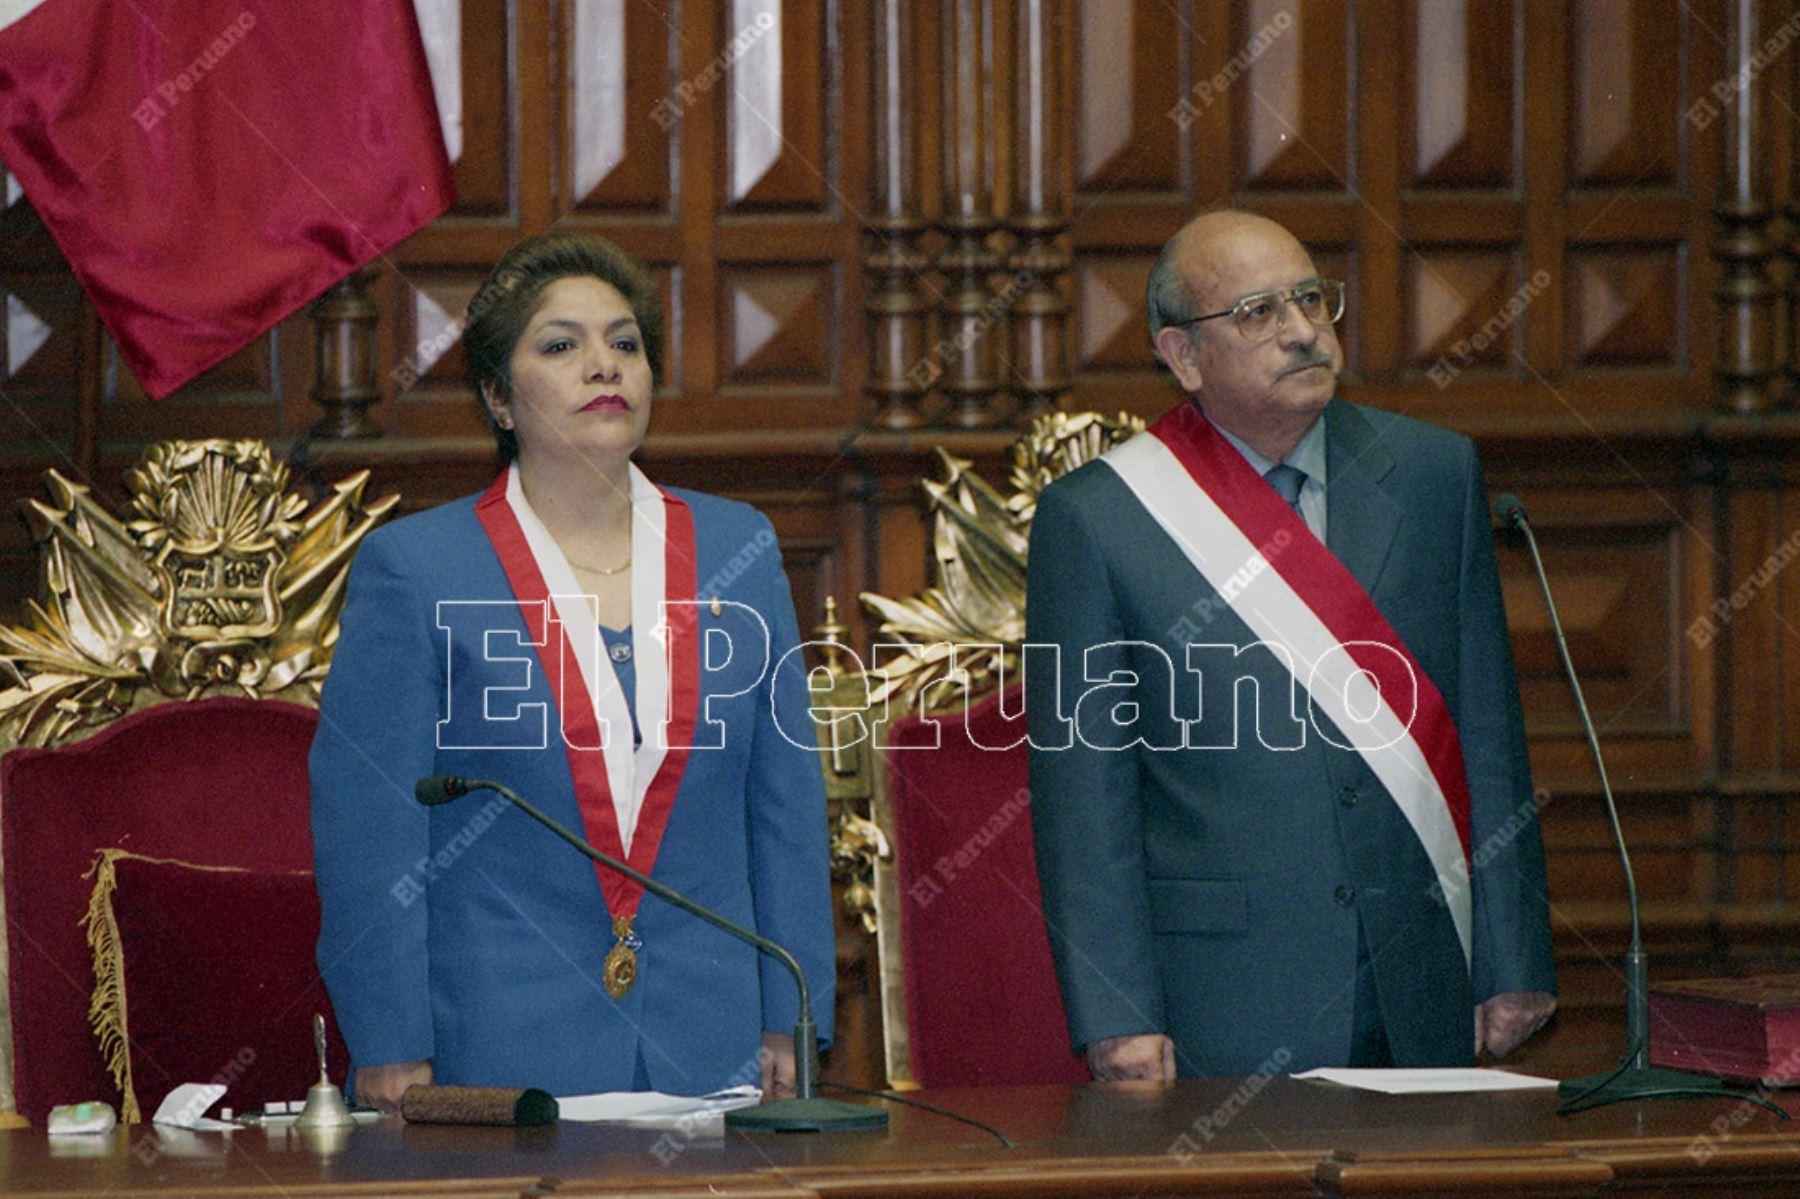 Lima - 22 noviembre 2000. Juramentación de Valentín Paniagua Corazao como presidente de la República. Foto: Diario Oficial El Peruano / Ricardo Choy-Kifox